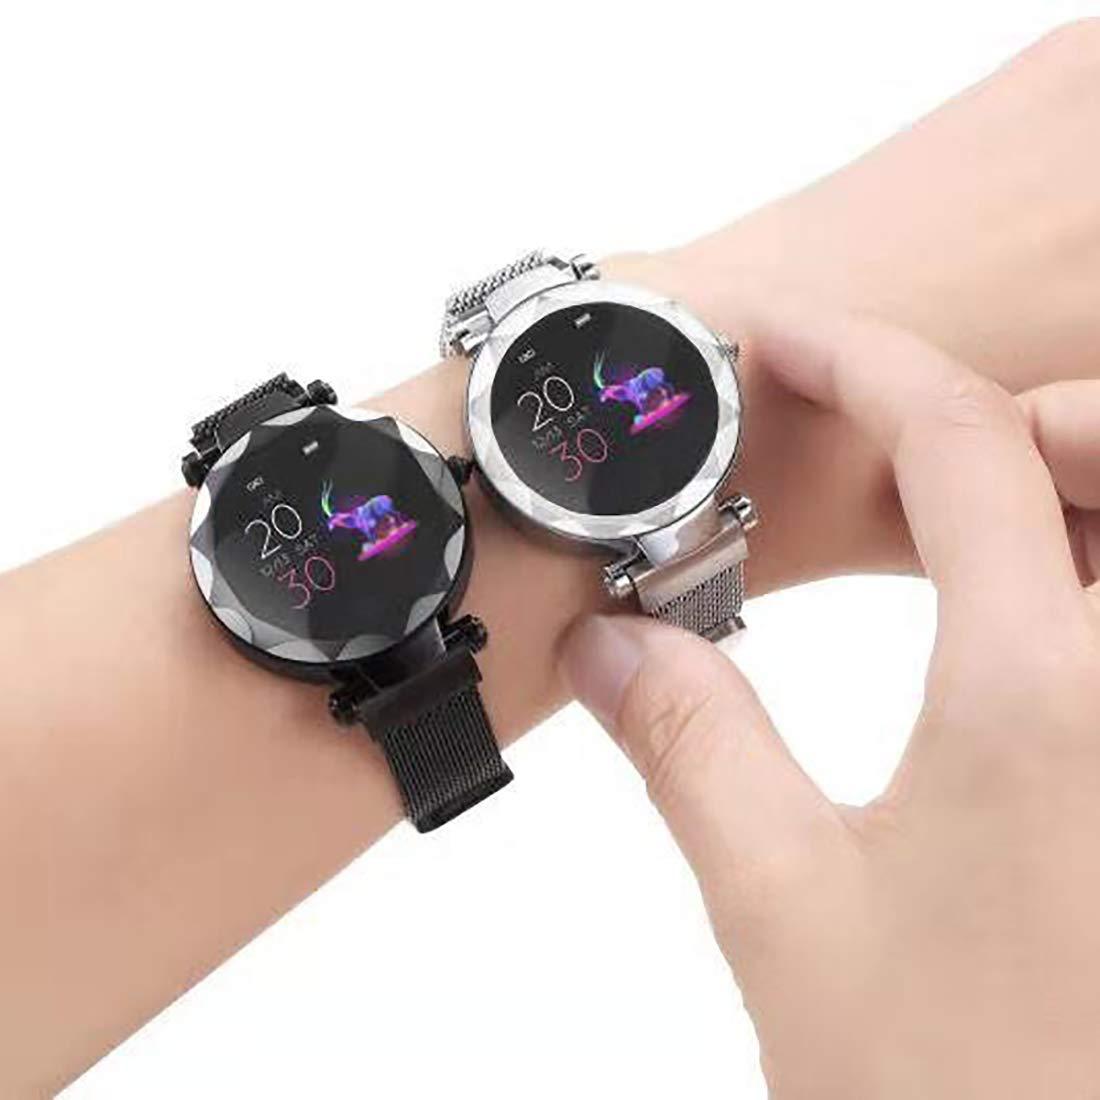 Amazon.com: omodofo - Reloj inteligente para mujer con ...